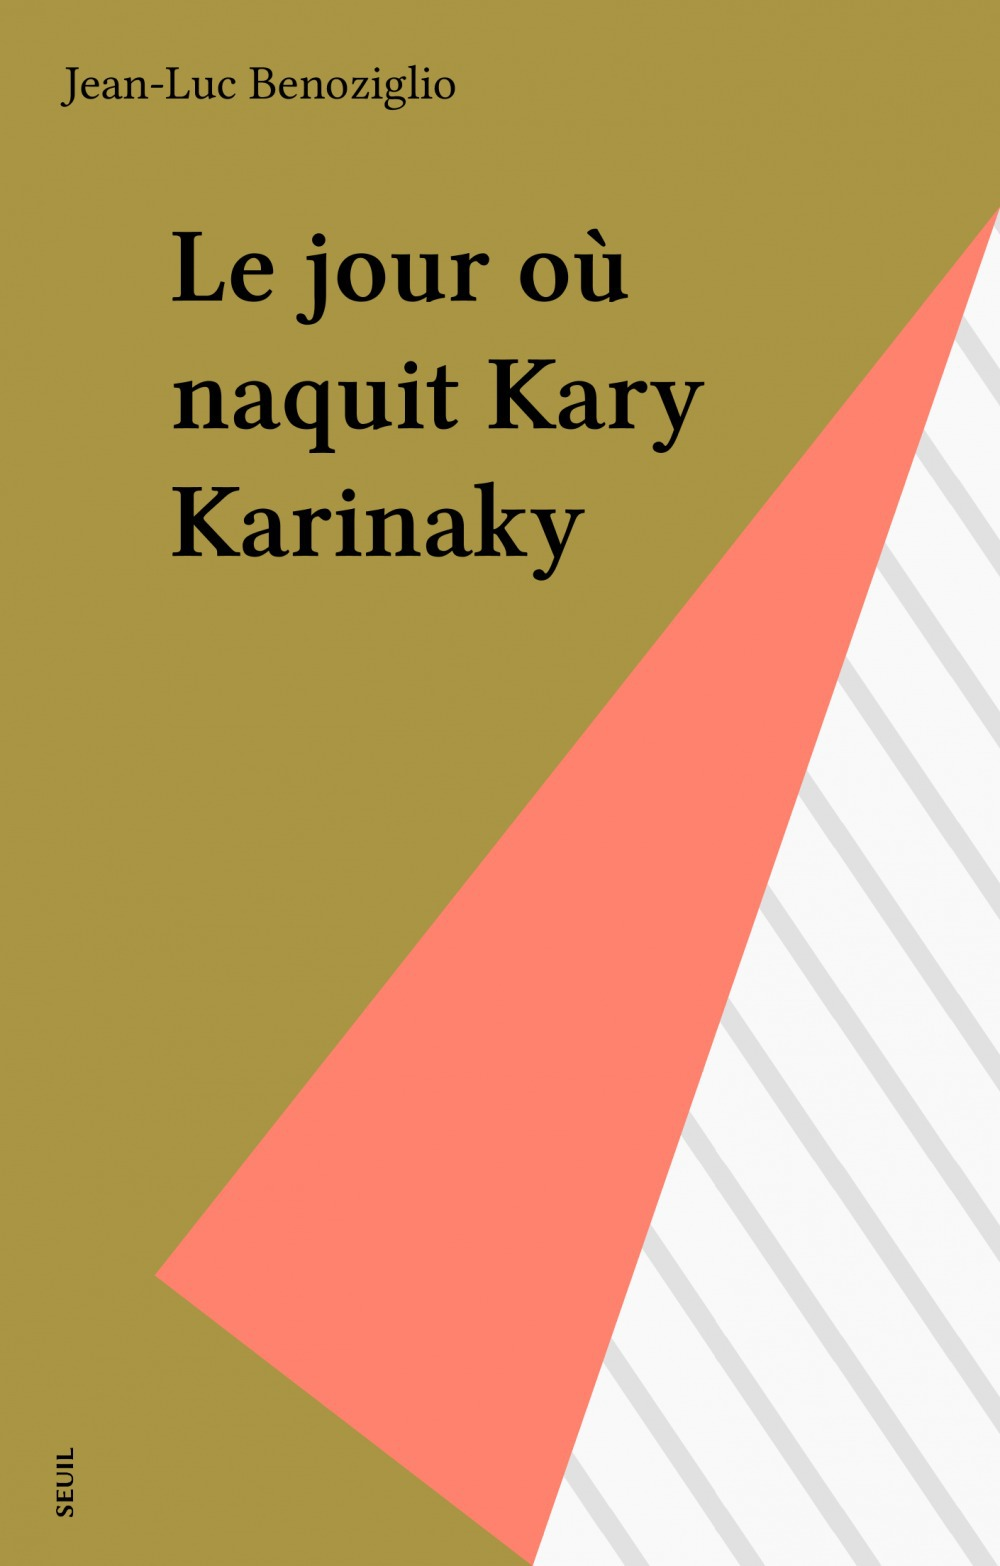 Jour ou naquit kary karinaky (le)